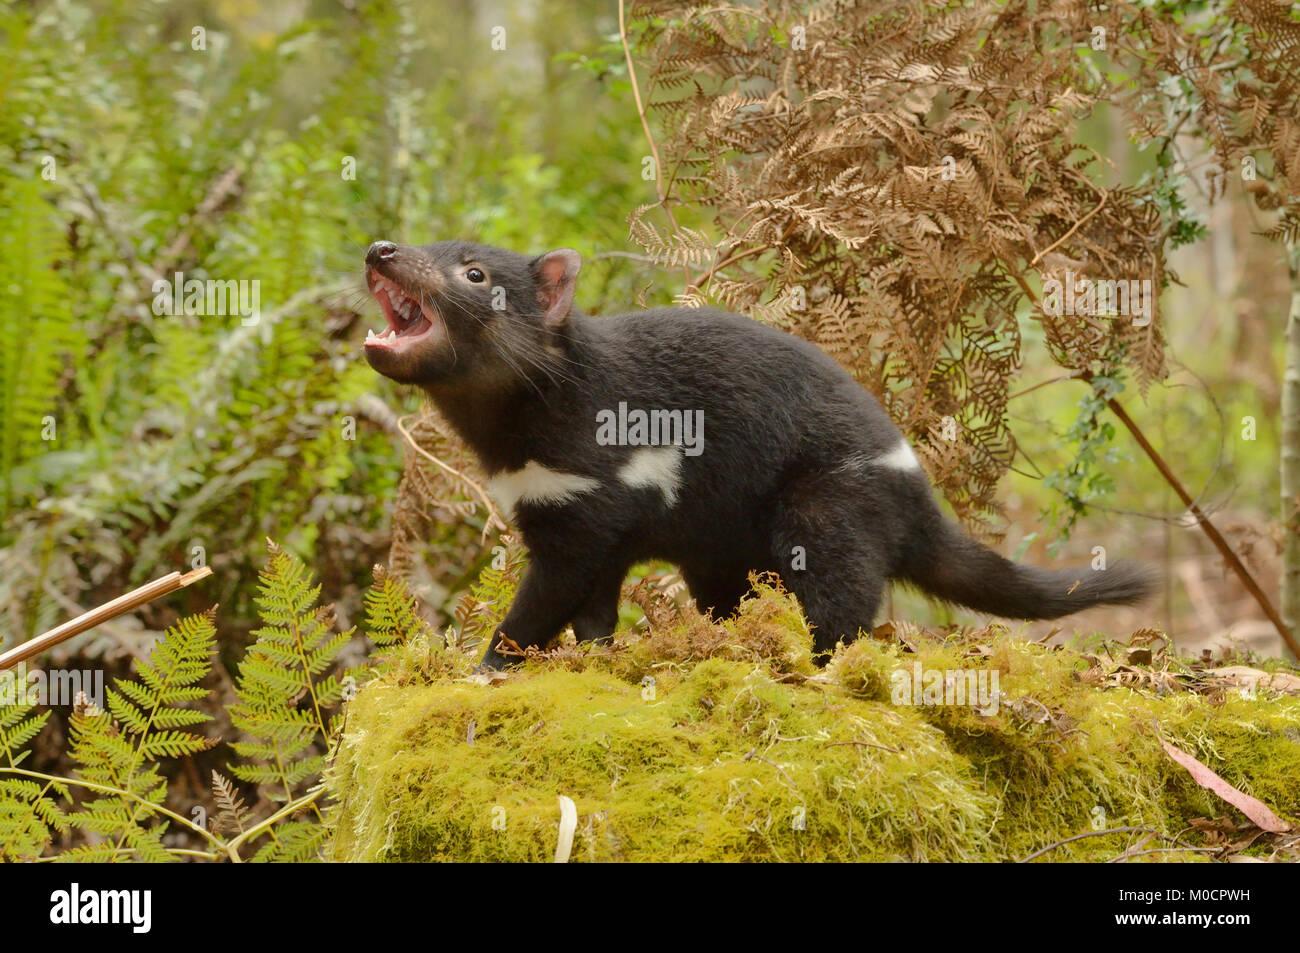 Tasmanian Devil Sarcophilus harrisii Young devil Snarling Photographed in Tasmania, Australia - Stock Image